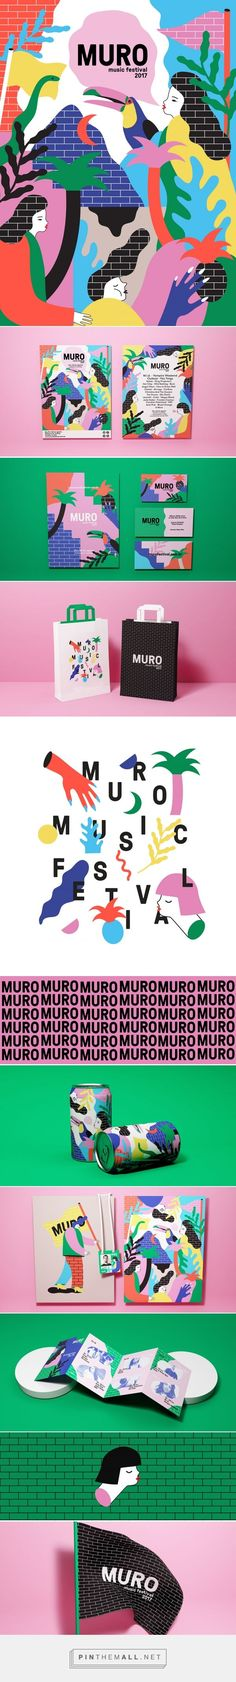 Muro Music Festival Branding by Giovani Flores | Fivestar Branding Agency – Design and Branding Agency & Curated Inspiration Gallery | https://lomejordelaweb.es/